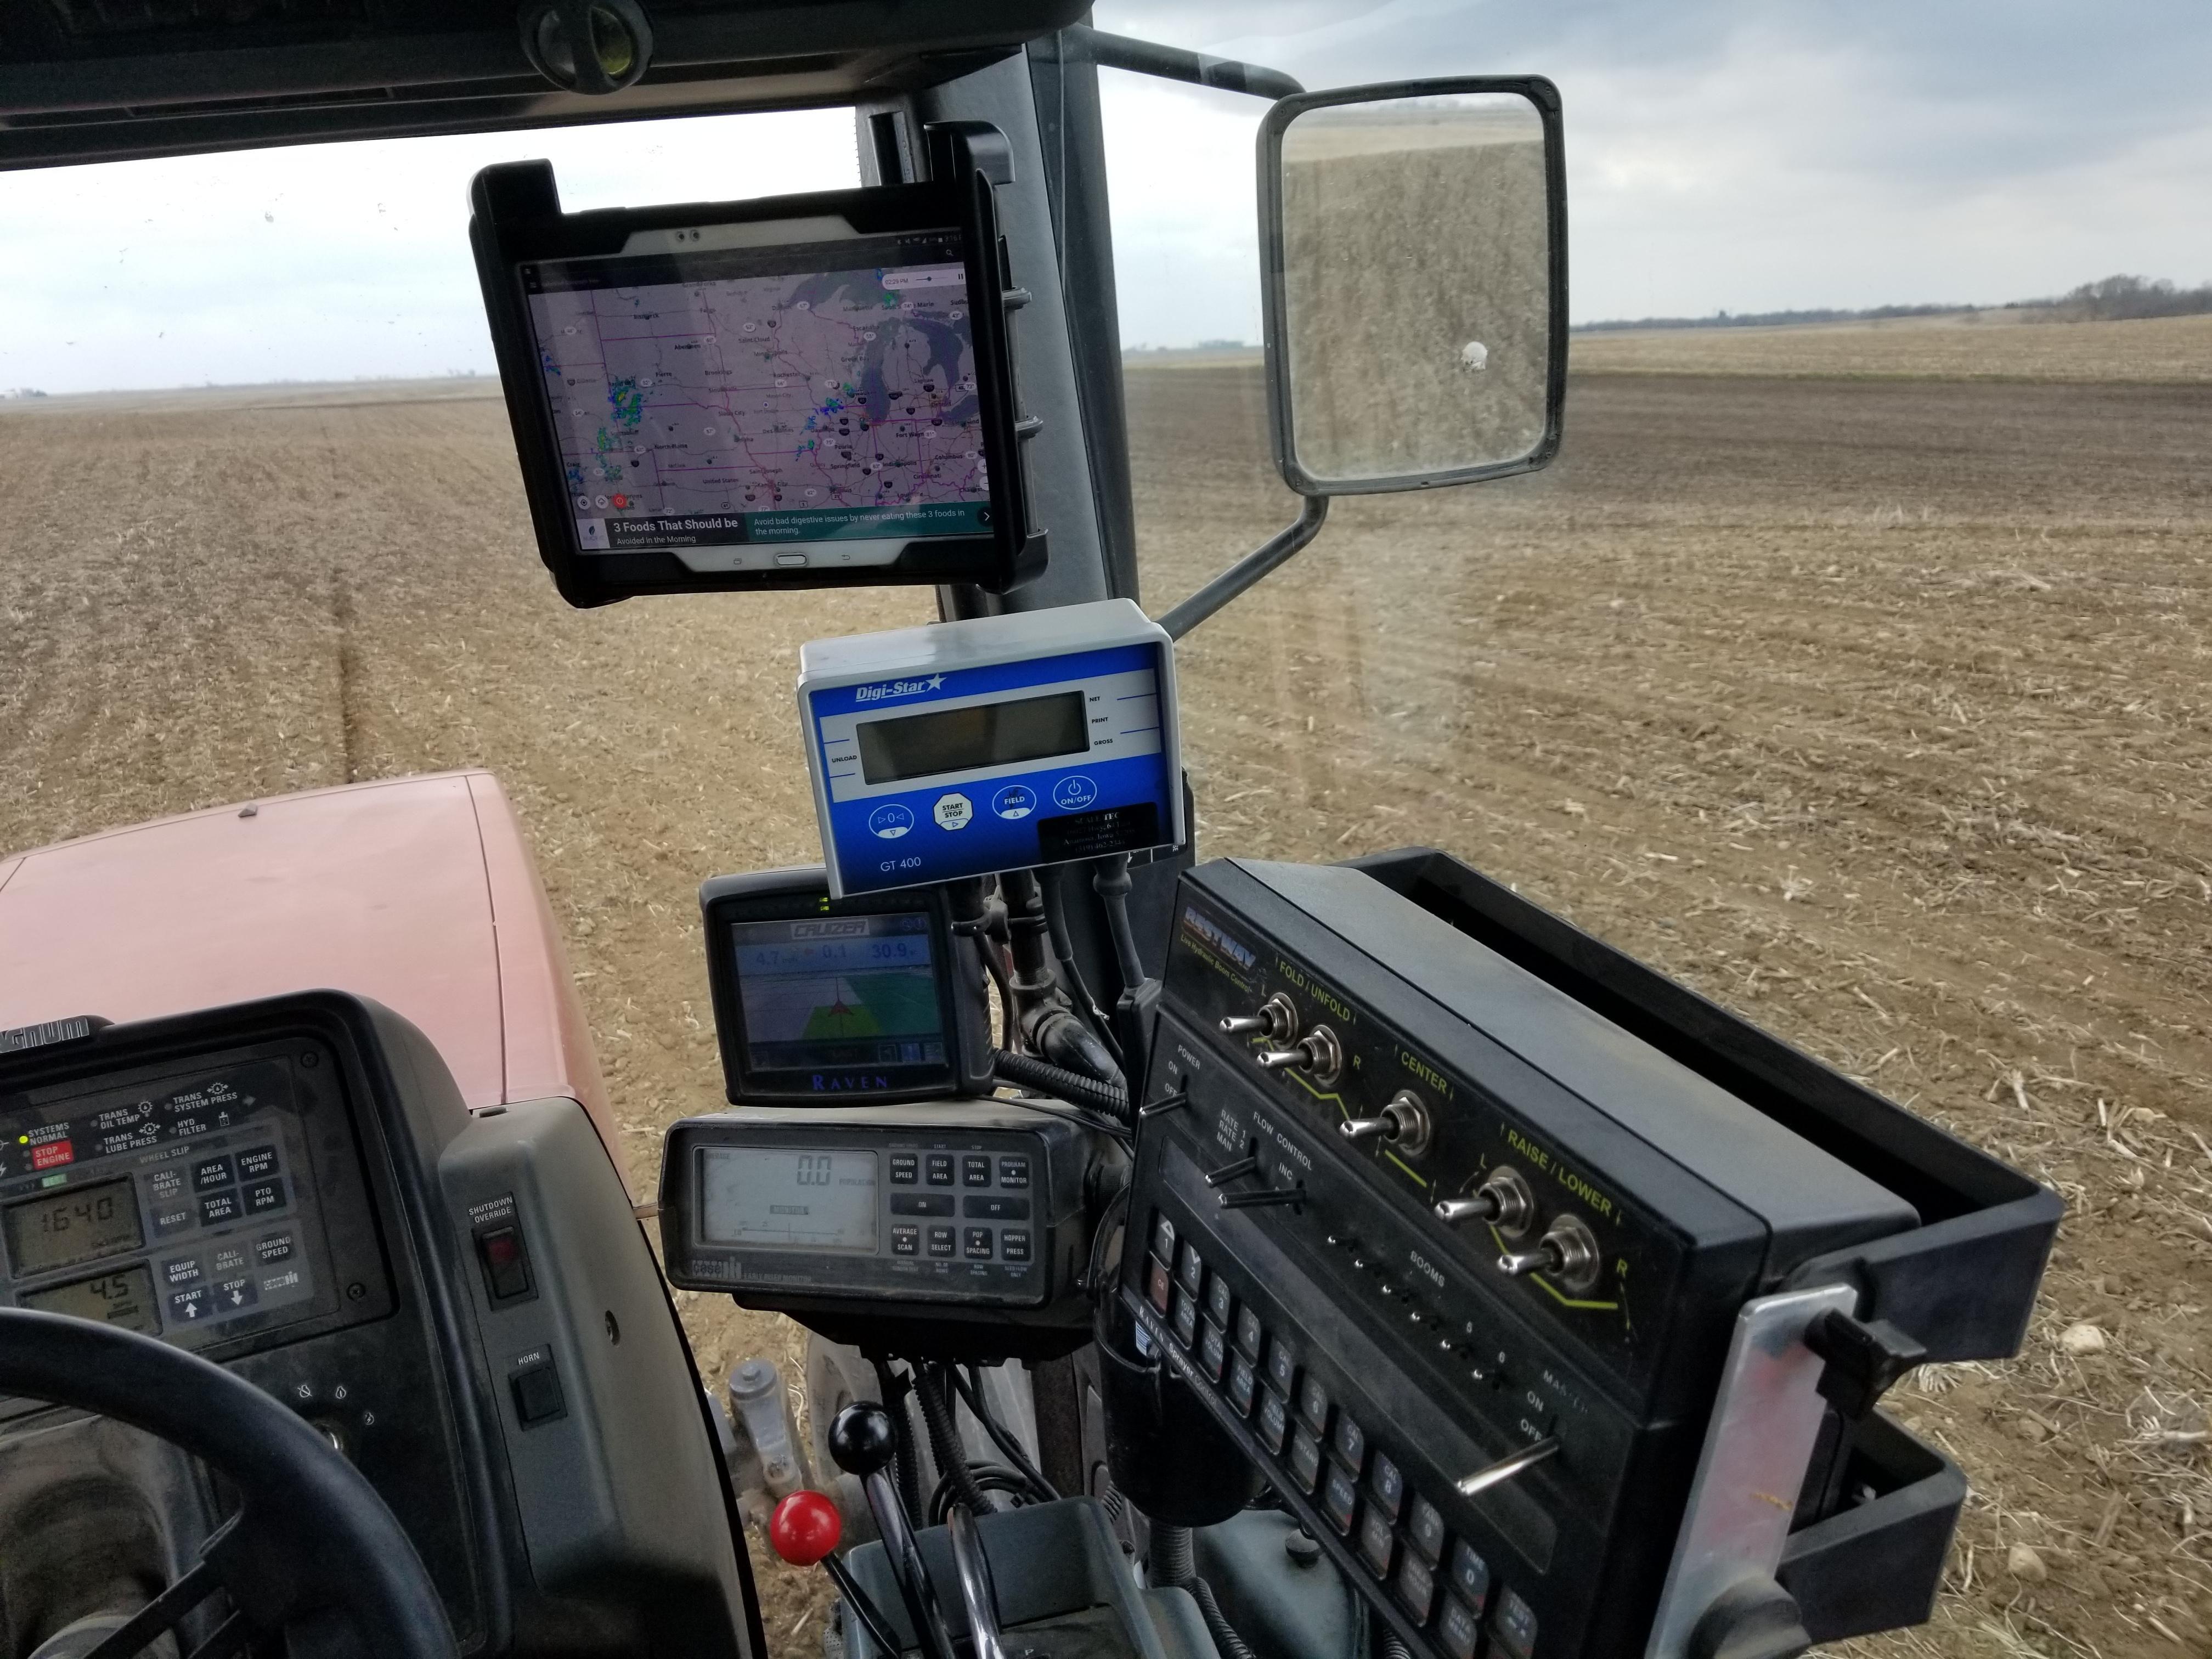 medium resolution of cih 7120 planting corn with classic early riser monitor raven cruiser gps digi star scale